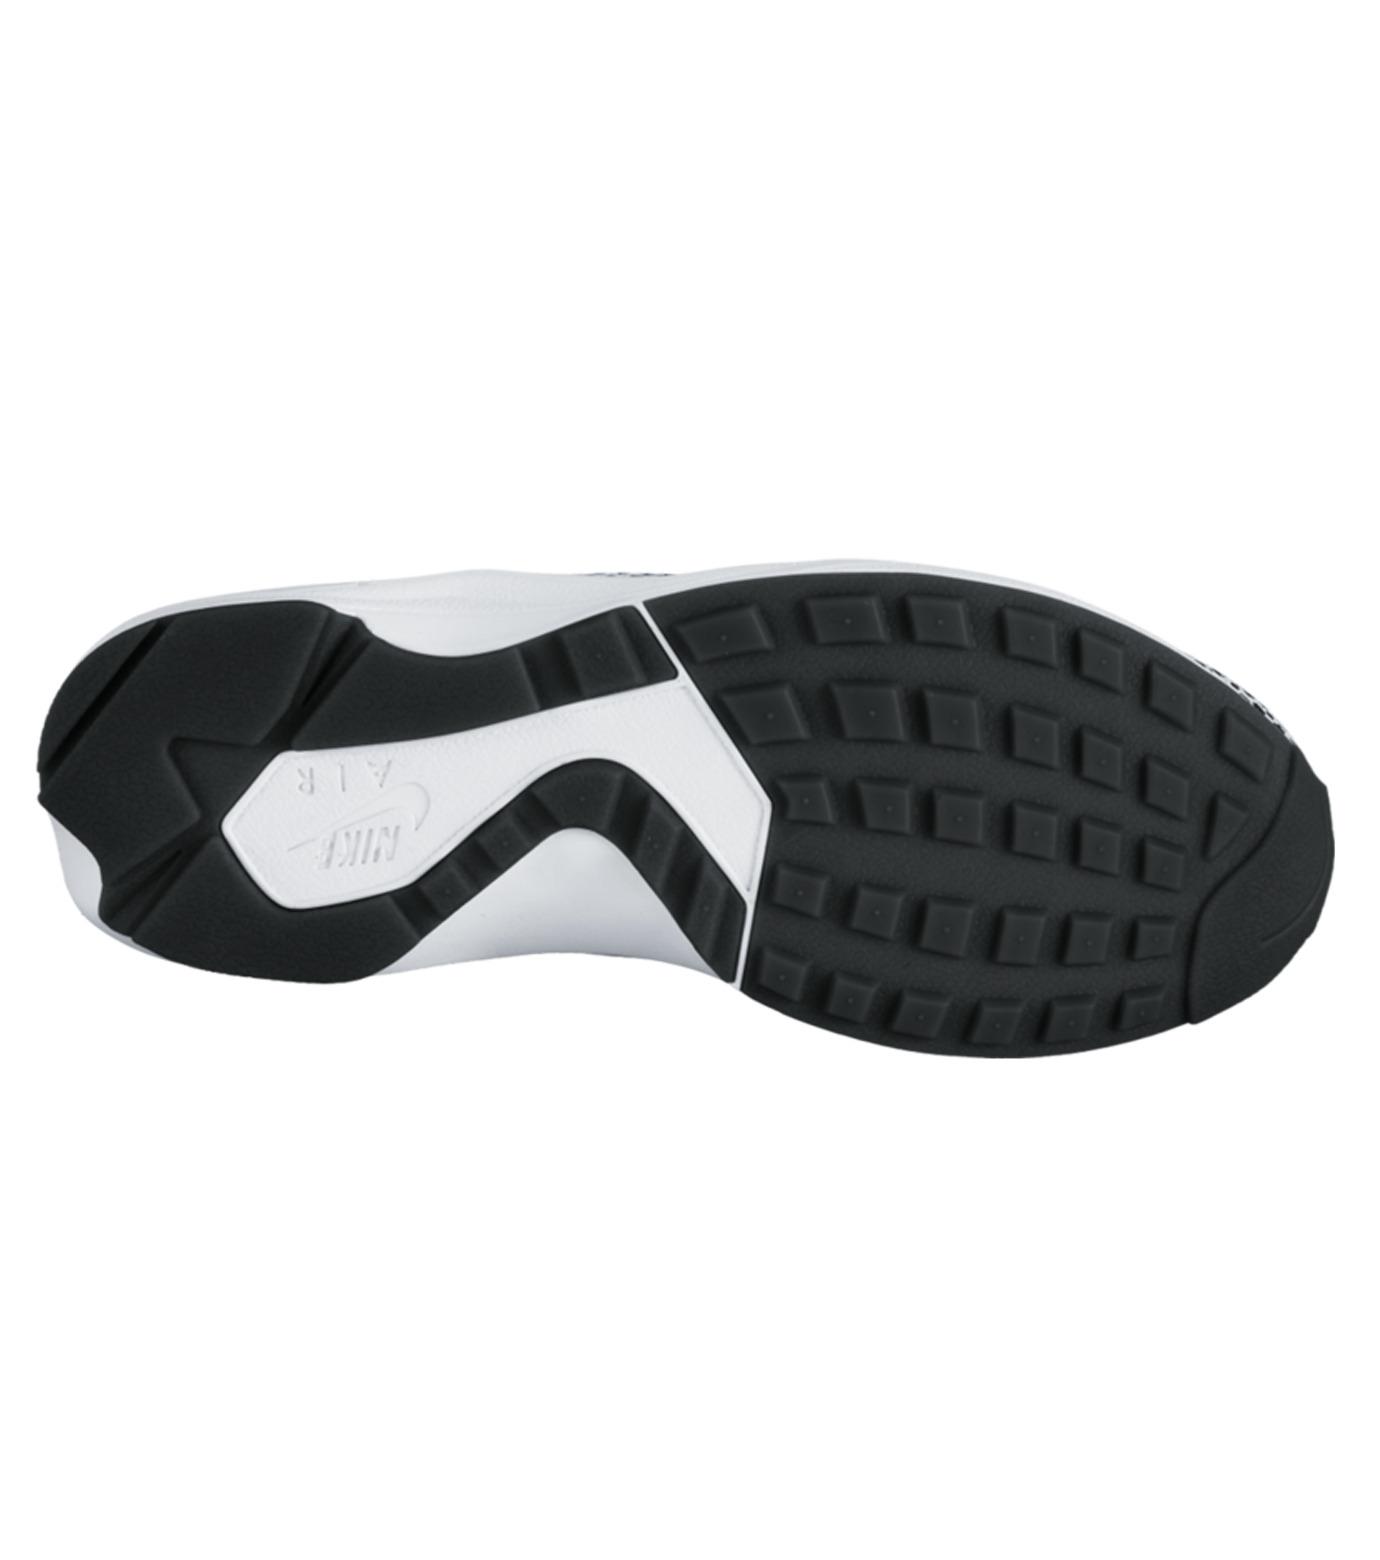 NIKE(ナイキ)のAIR HUARACHE LIGHT-WHITE(シューズ/shoes)-819011-100-4 拡大詳細画像2